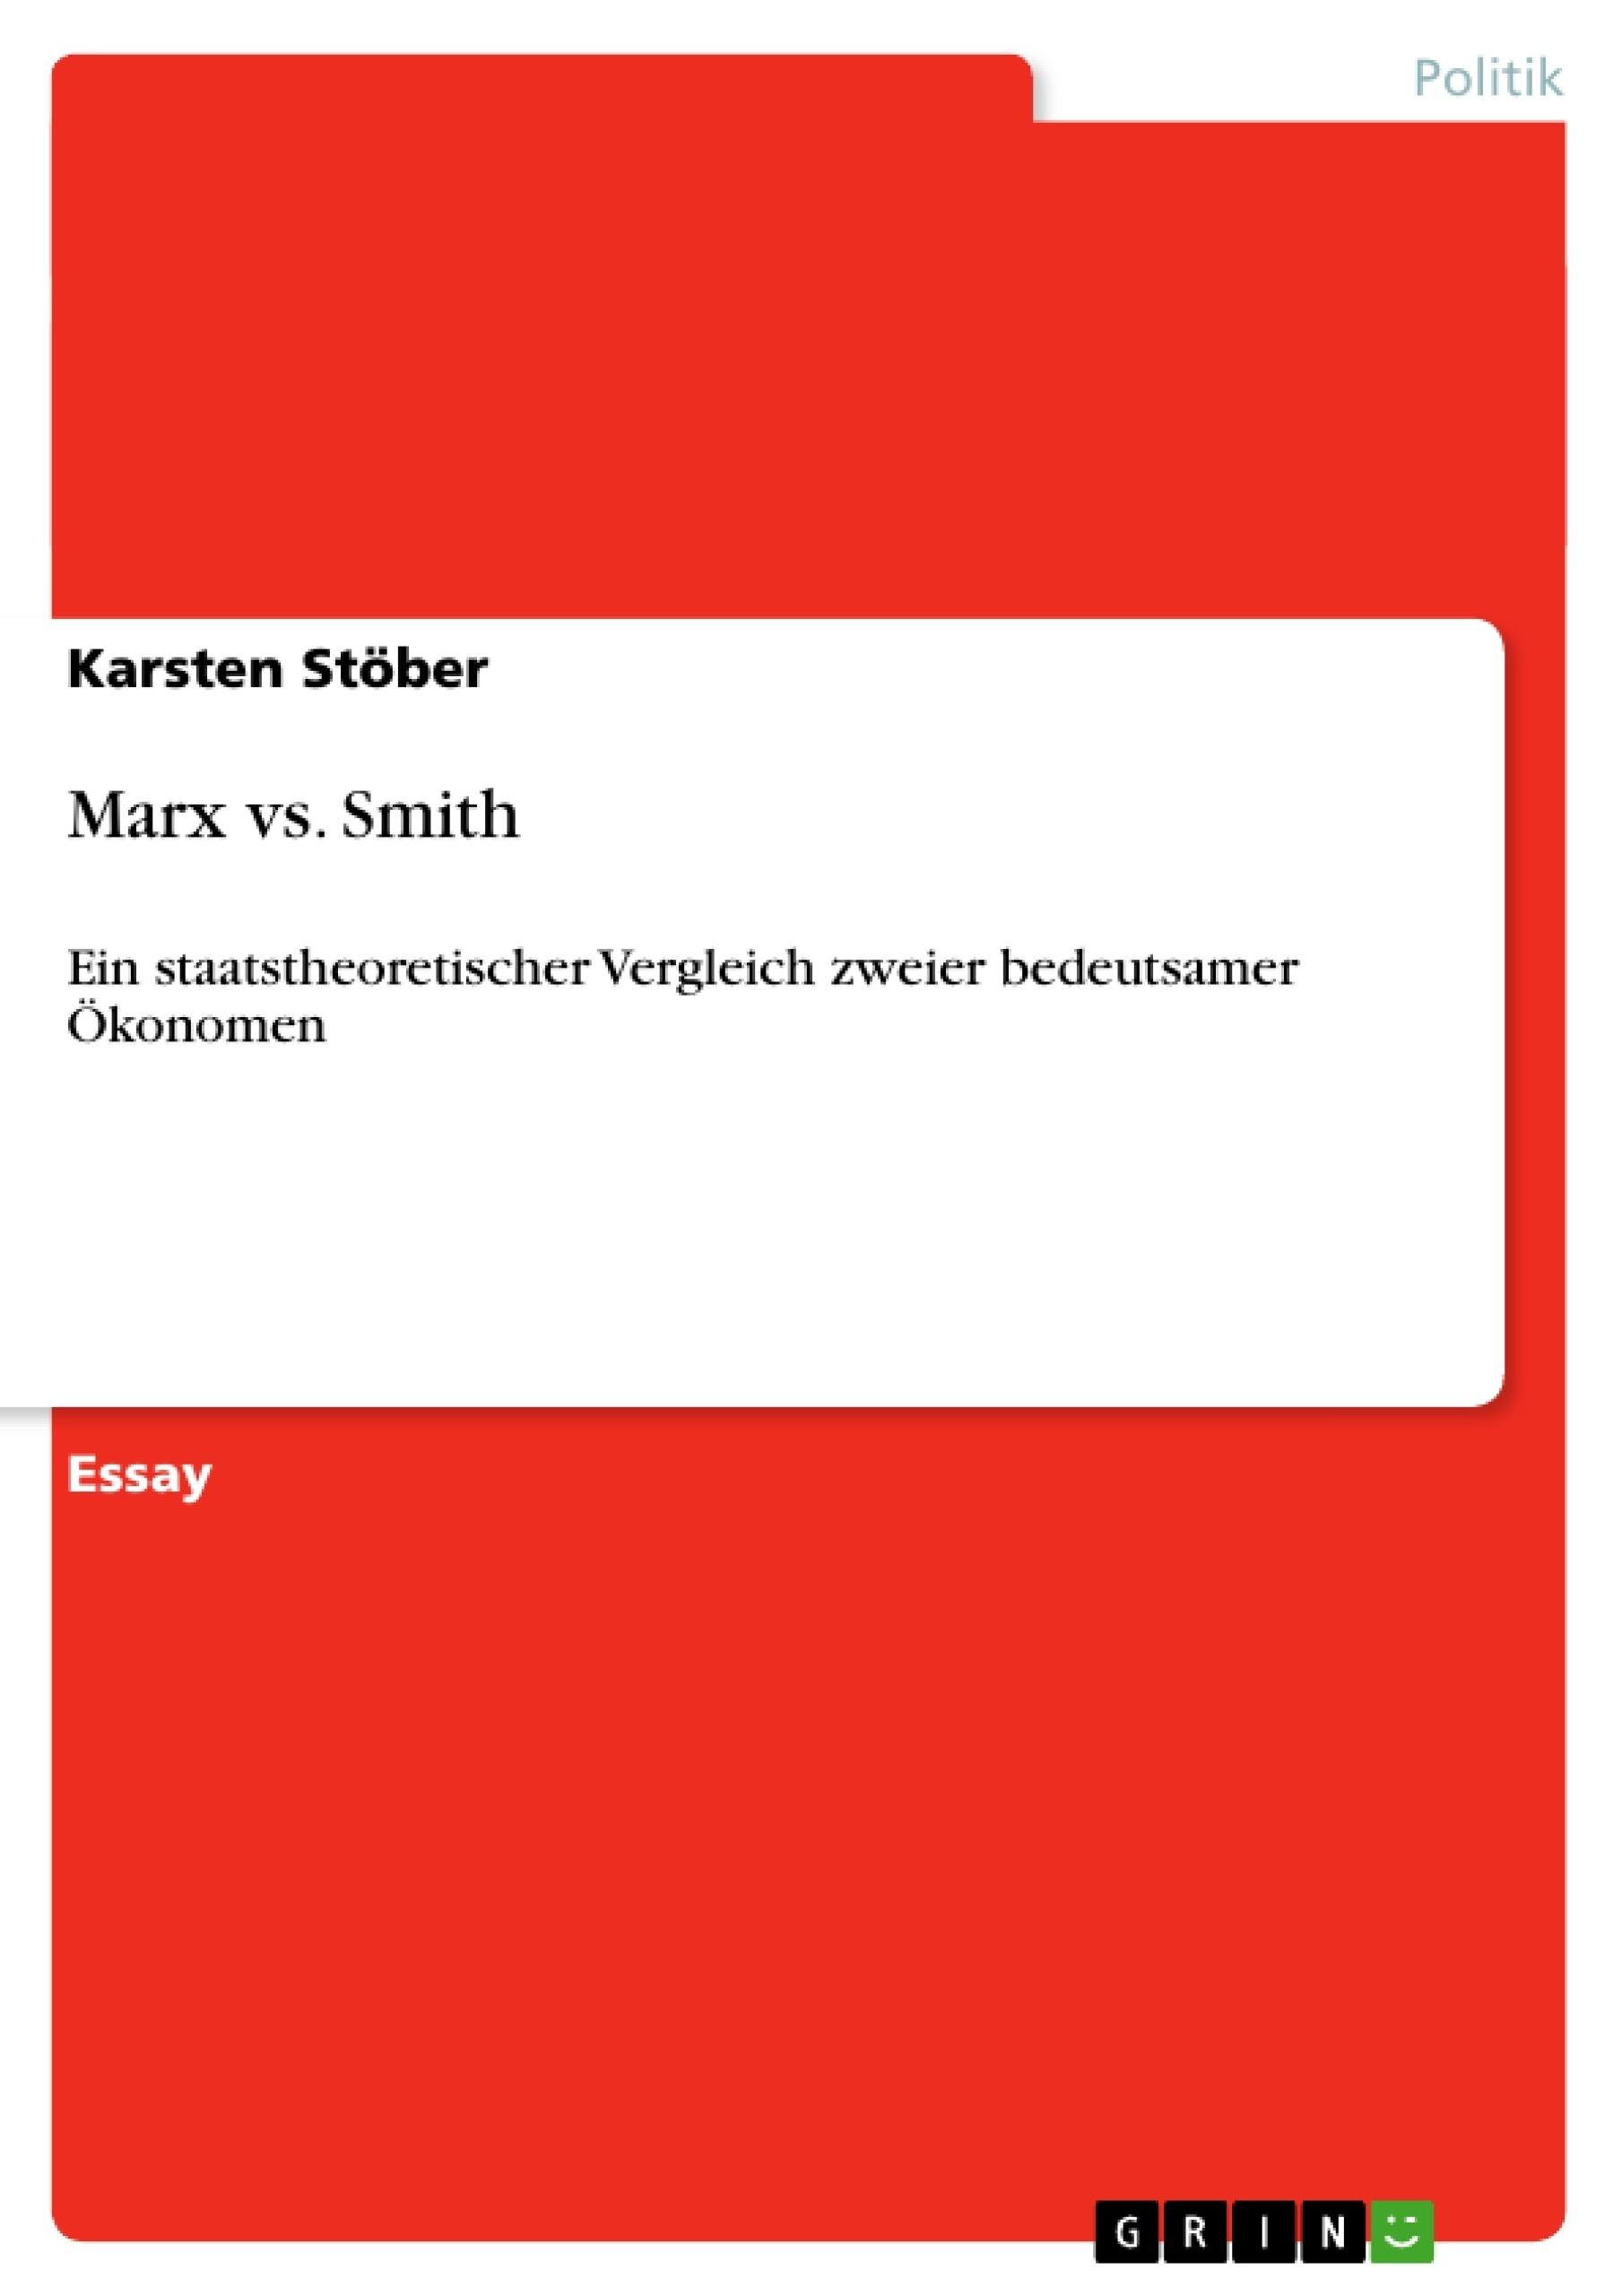 Titel: Marx vs. Smith